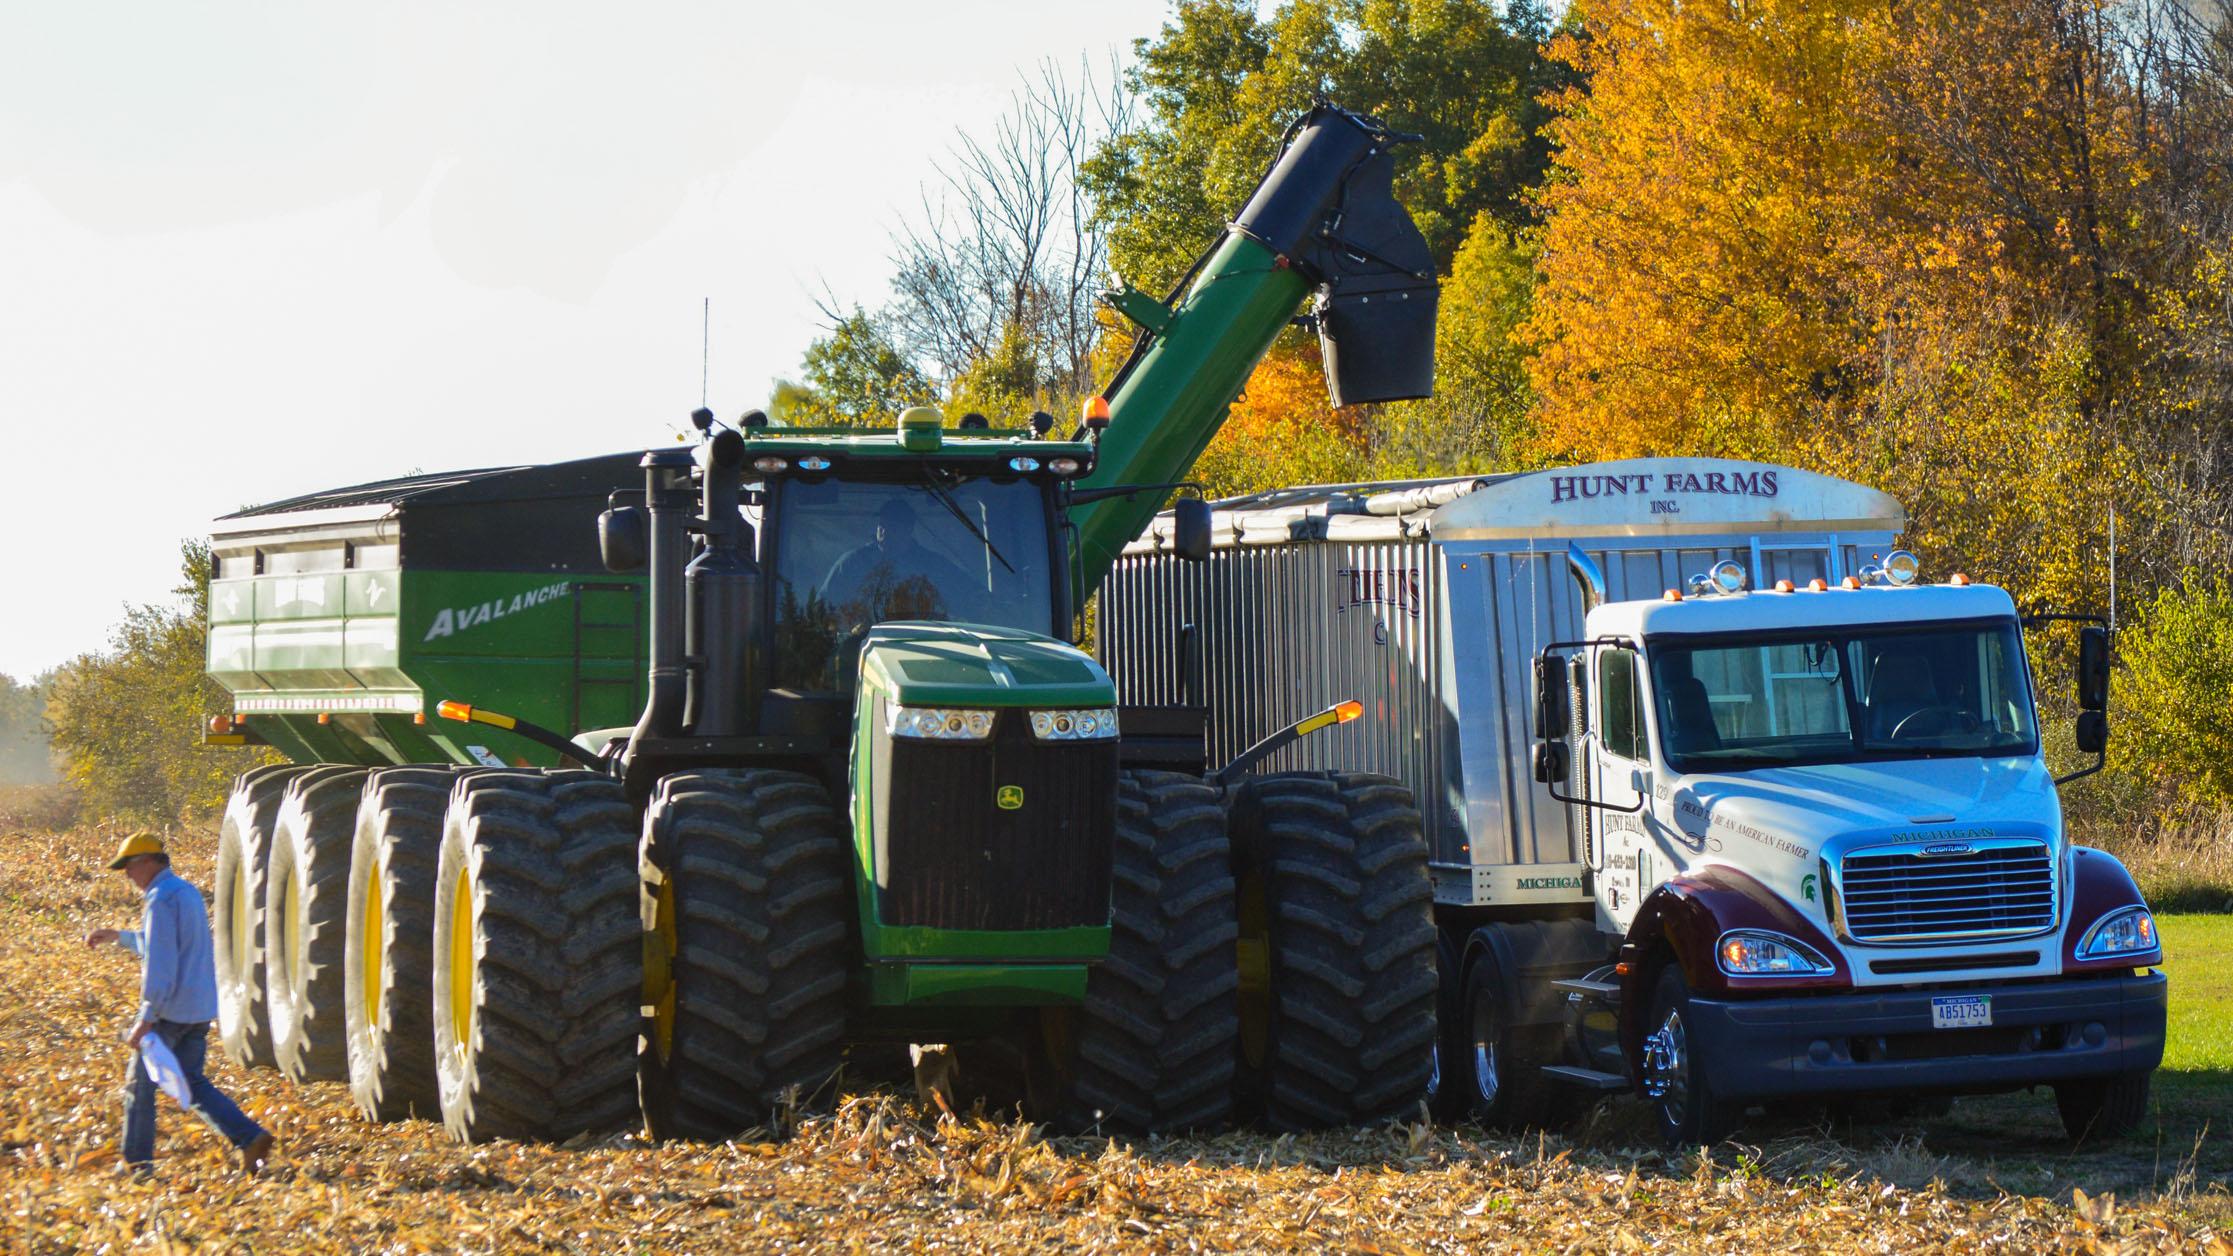 Hunt Farms harvesting corn, Genesee County, MI